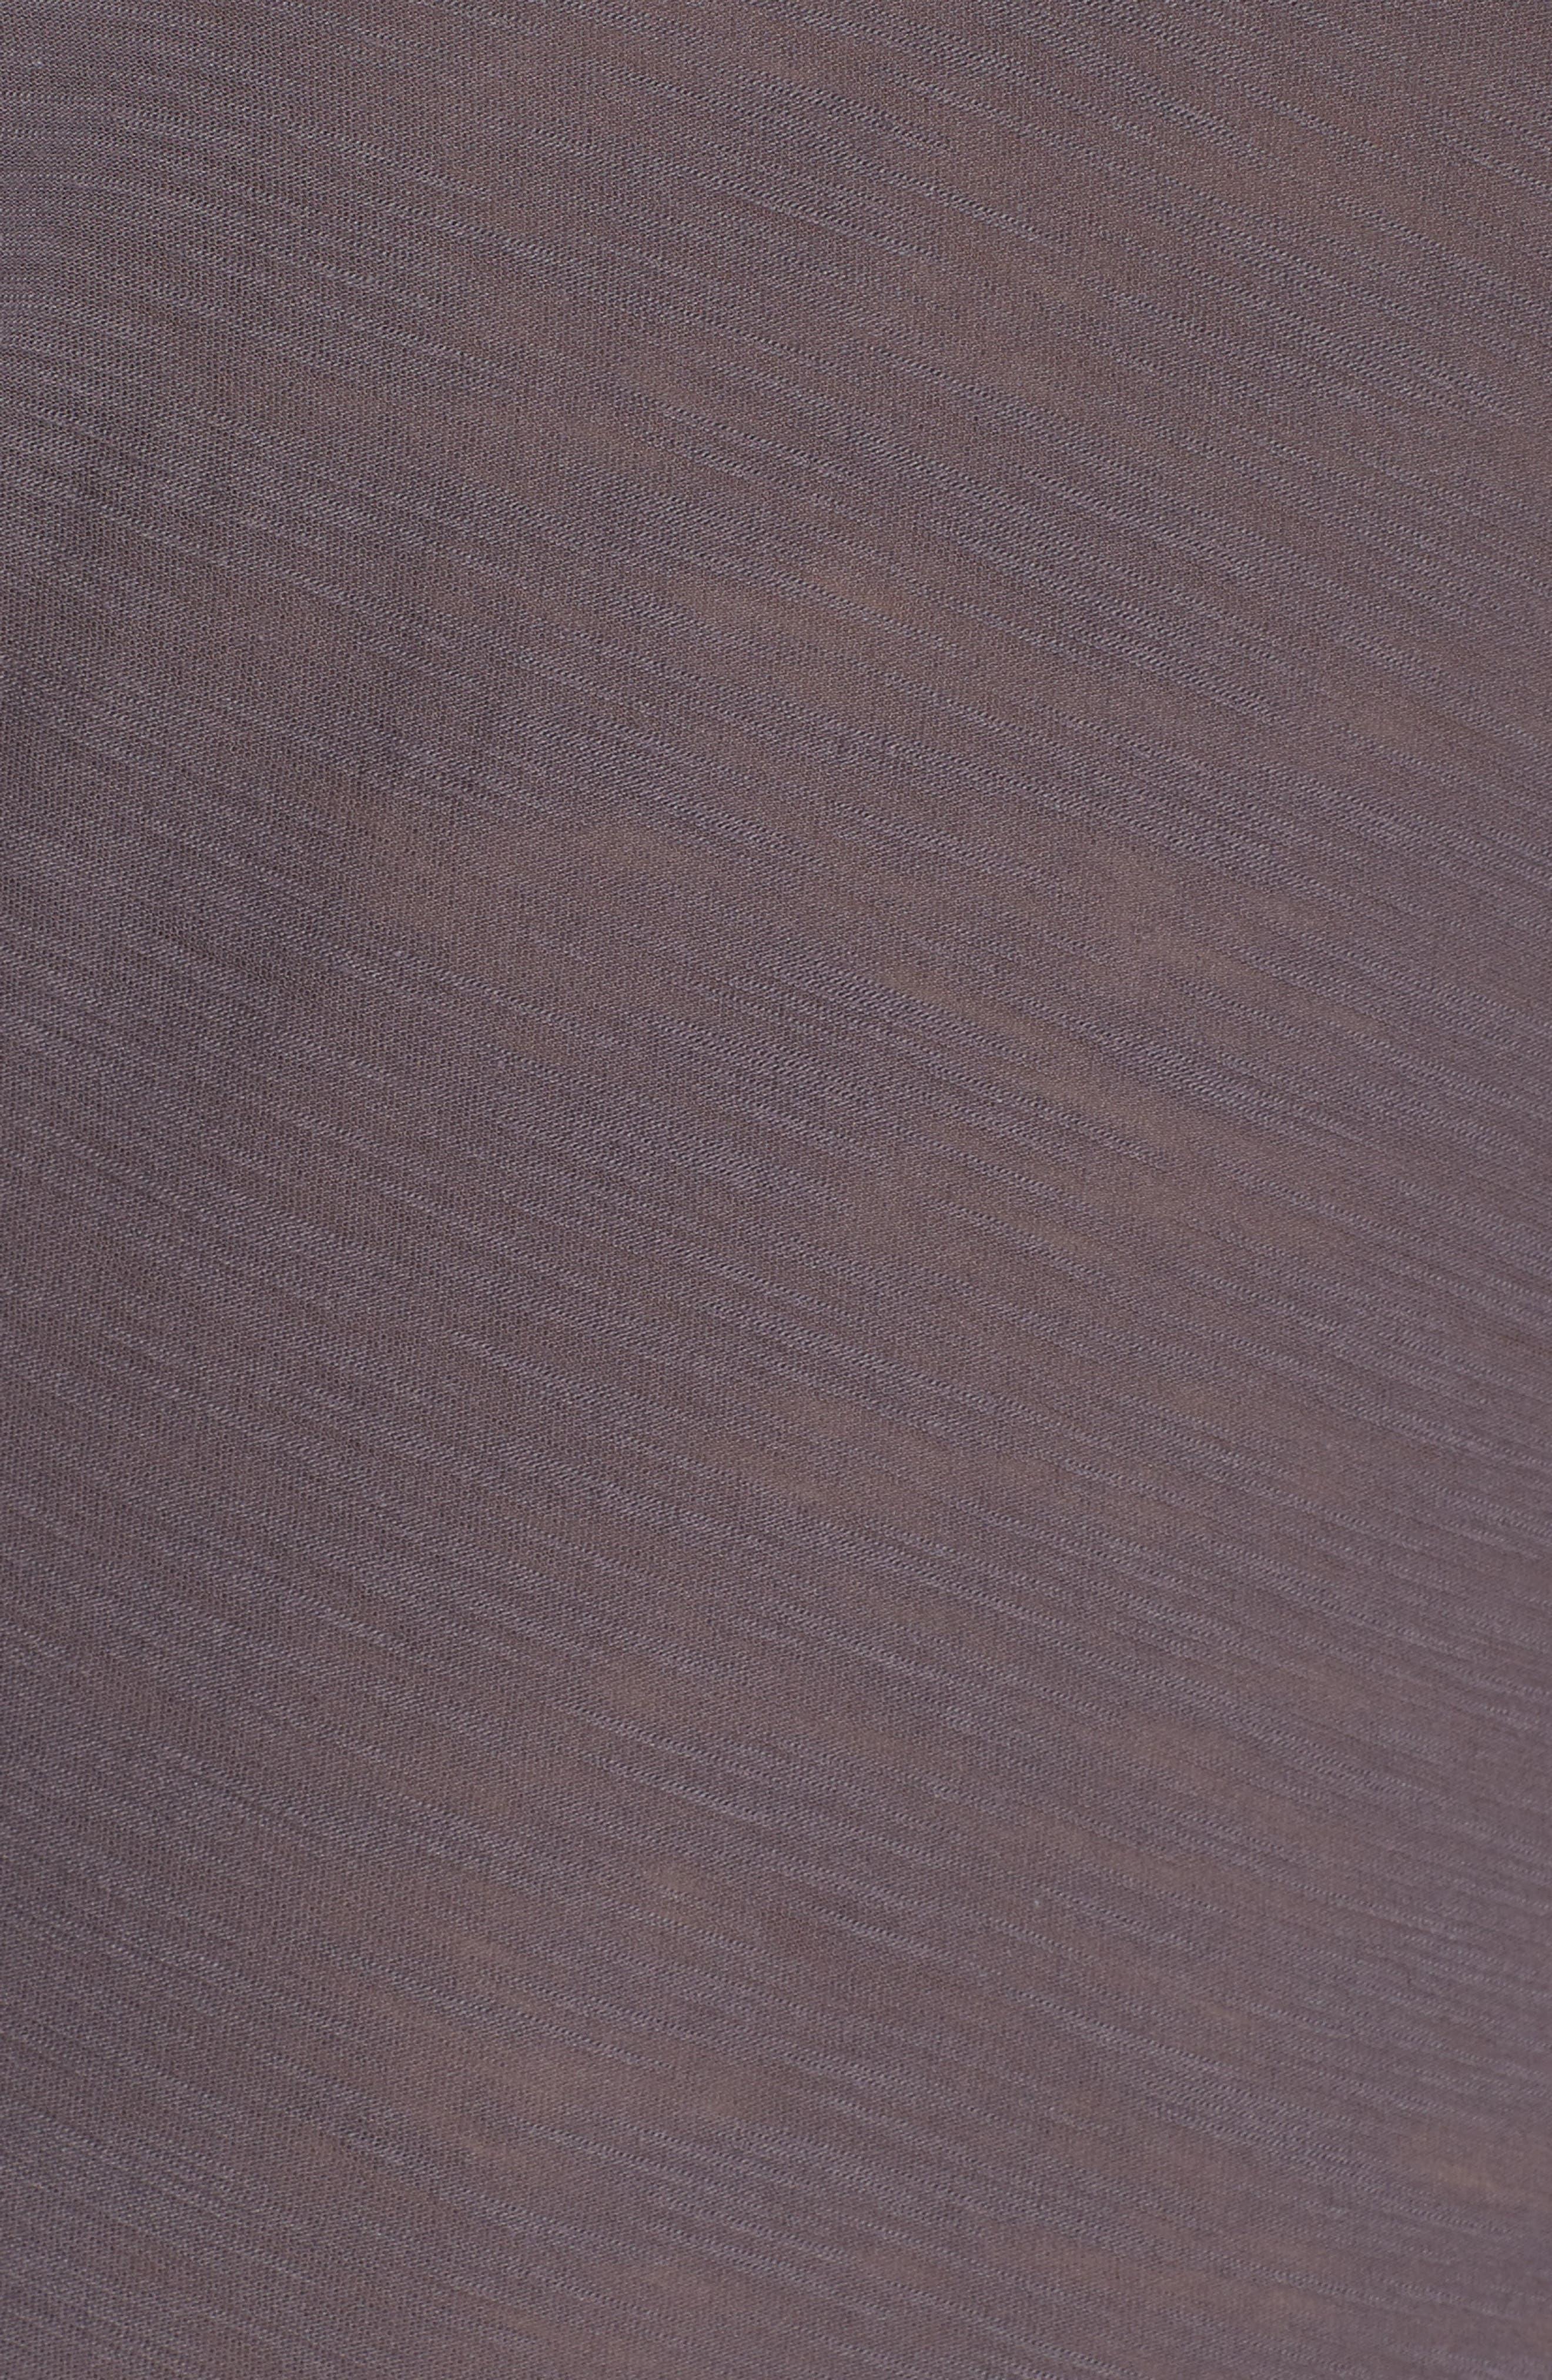 Slub Cotton V-Neck Tee,                             Alternate thumbnail 5, color,                             Pollock